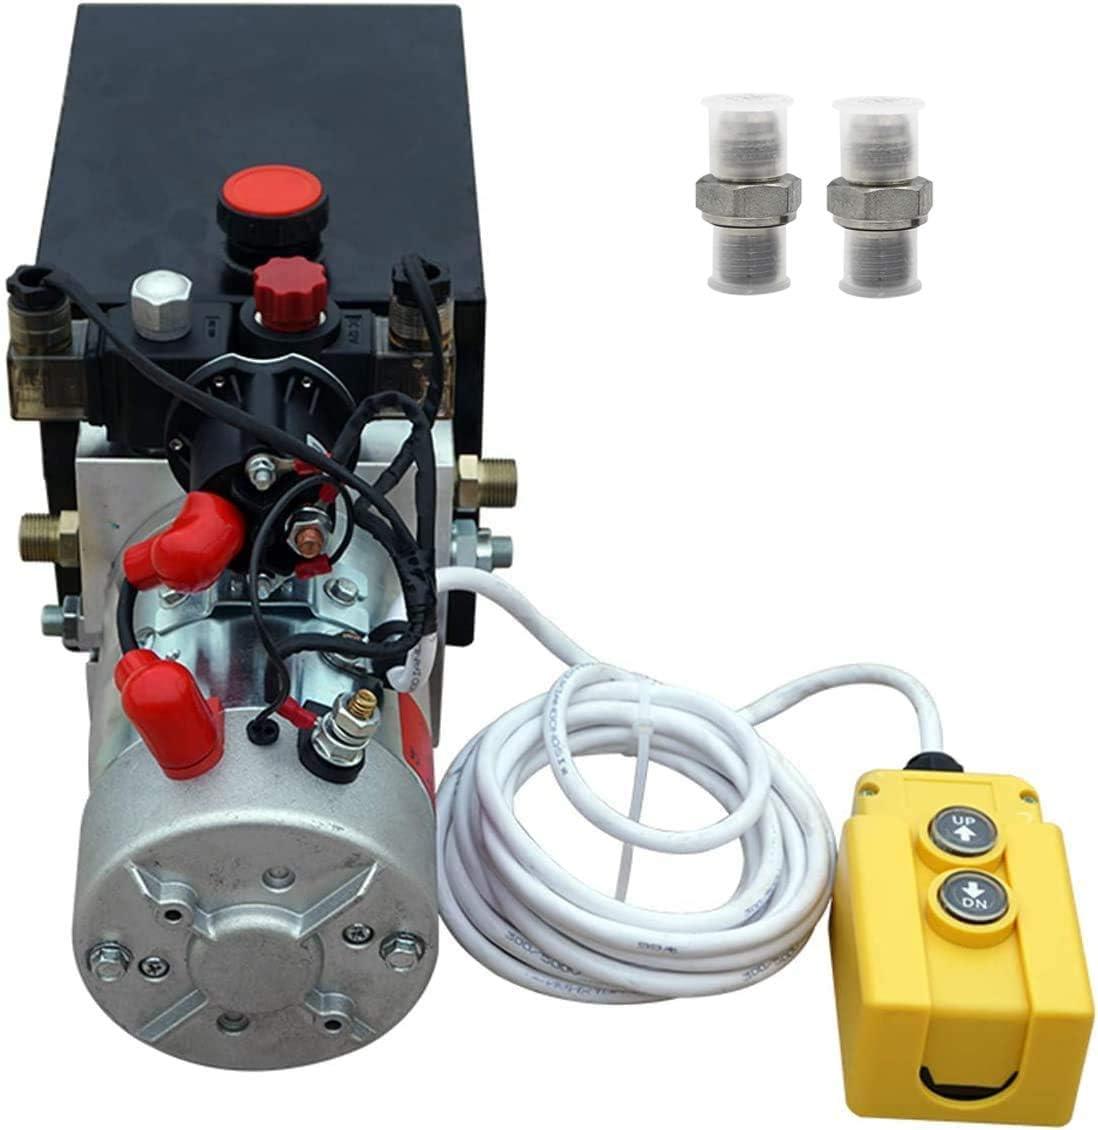 Amazon.com: New 12V Hydraulic Pump /Hydraulic power unit/Electric dump  trailer power unit (Double Acting 6 Quart ): Home Improvement | Wrecker Hydraulic Wiring Diagram |  | Amazon.com